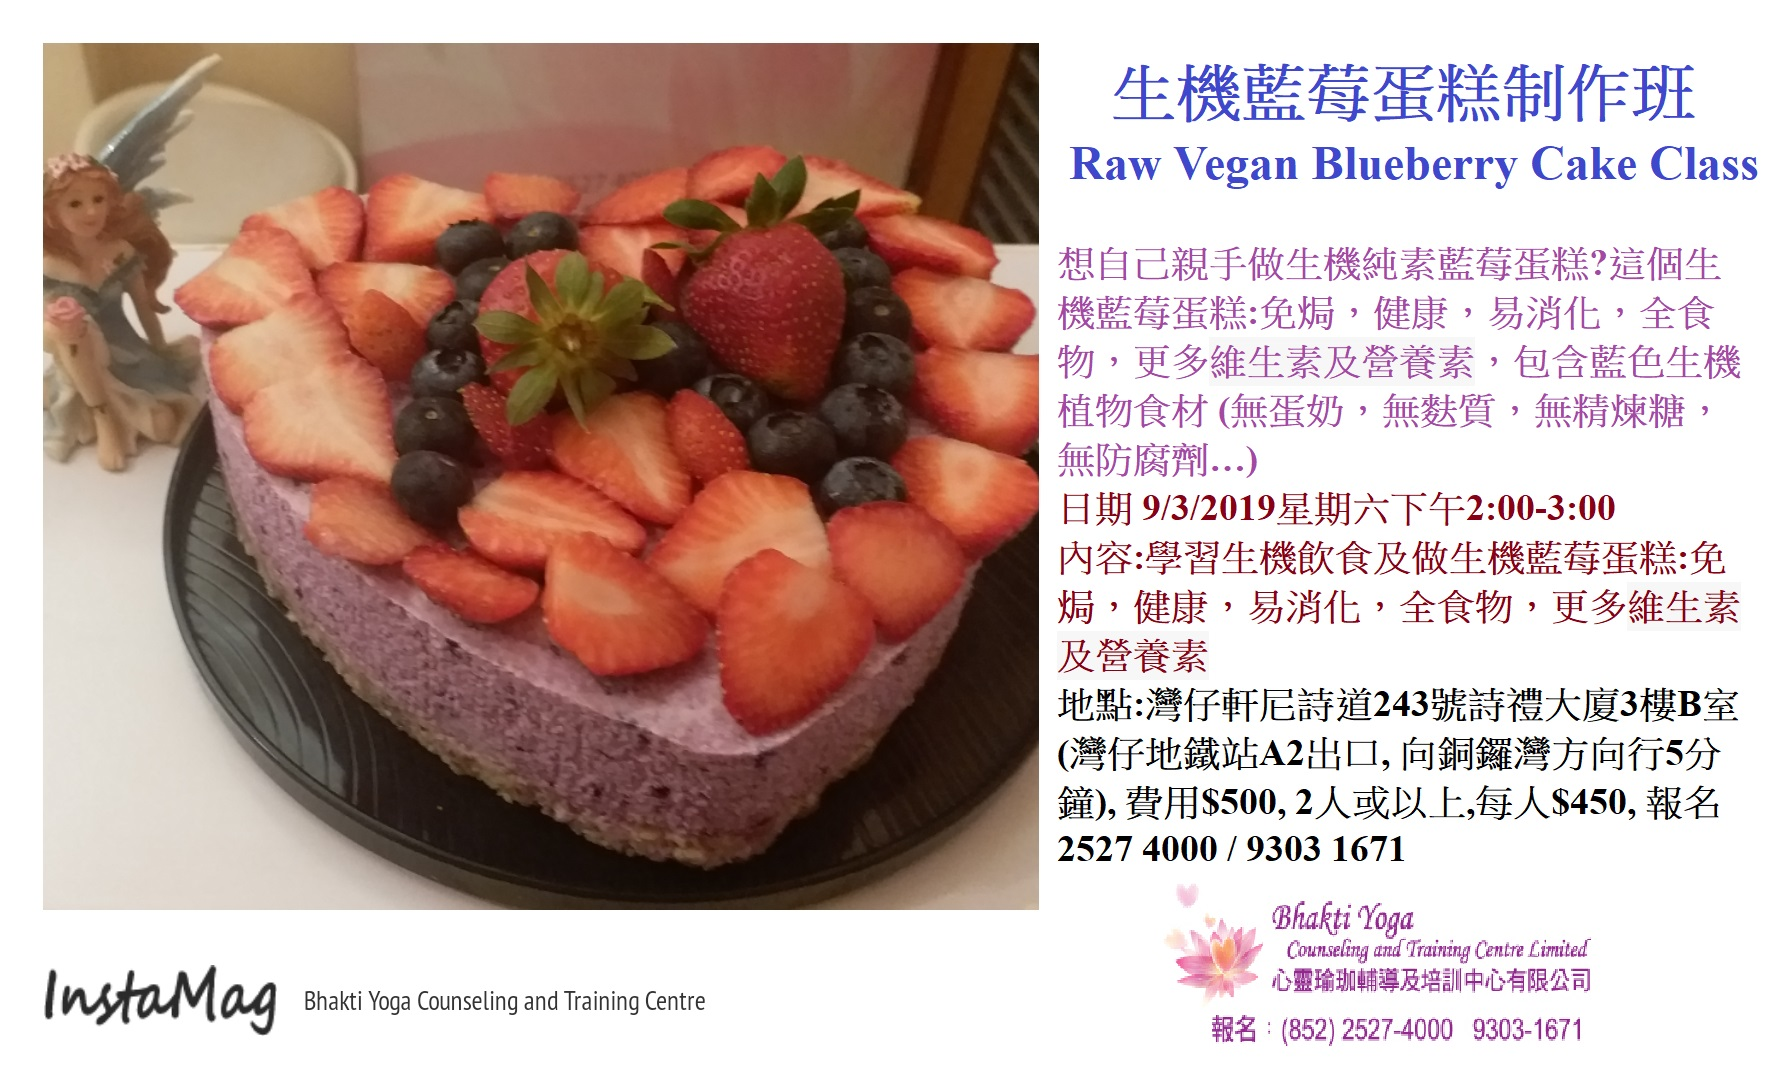 生機藍莓蛋糕制作班Raw Vegan Blueberry Cake Class   Bhakti Yoga Counseling and Training Centre